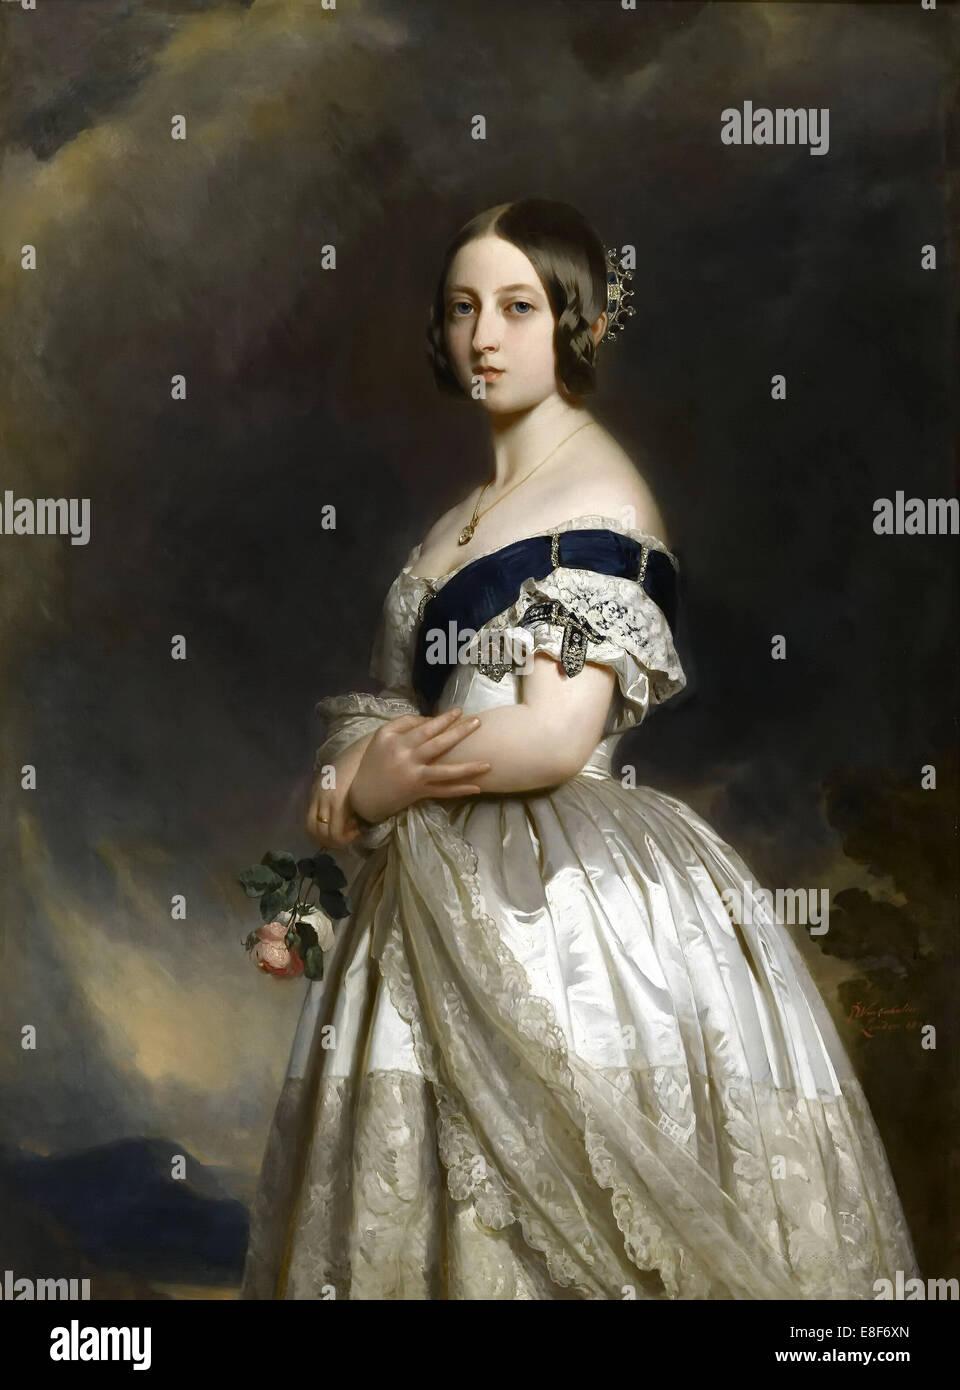 Portrait of Queen Victoria. Artist: Winterhalter, Franz Xavier (1805-1873) - Stock Image